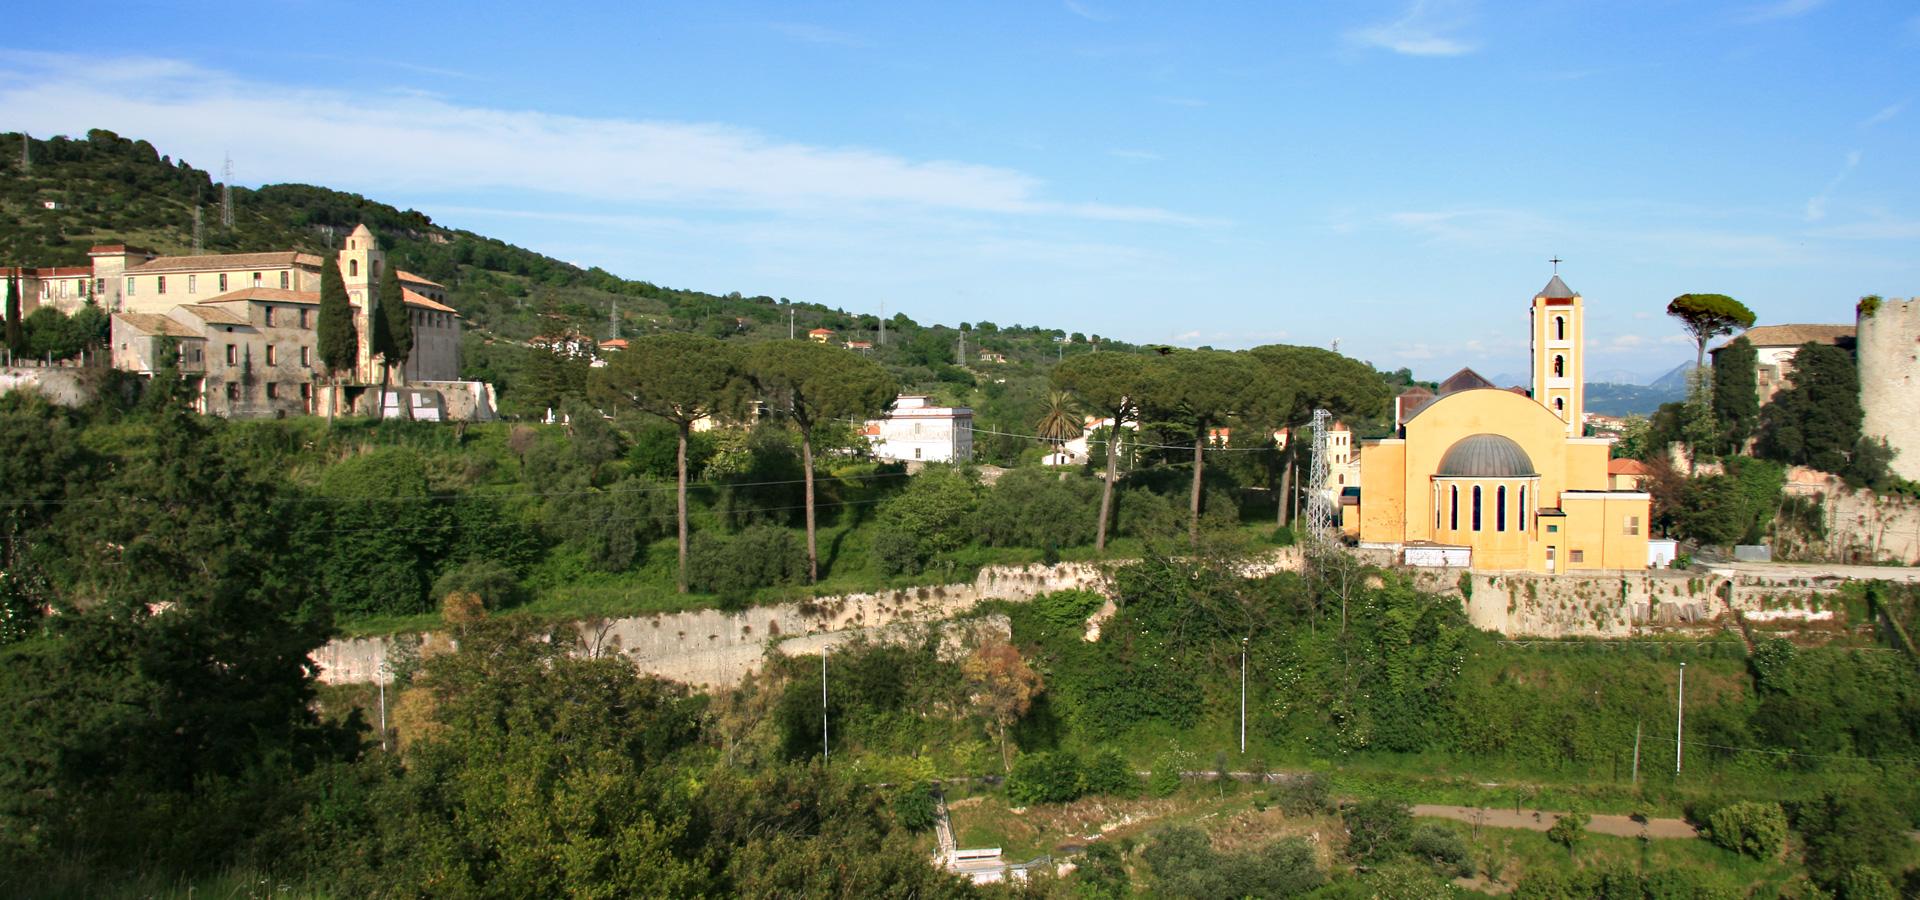 Badia San Pietro alli Marmi